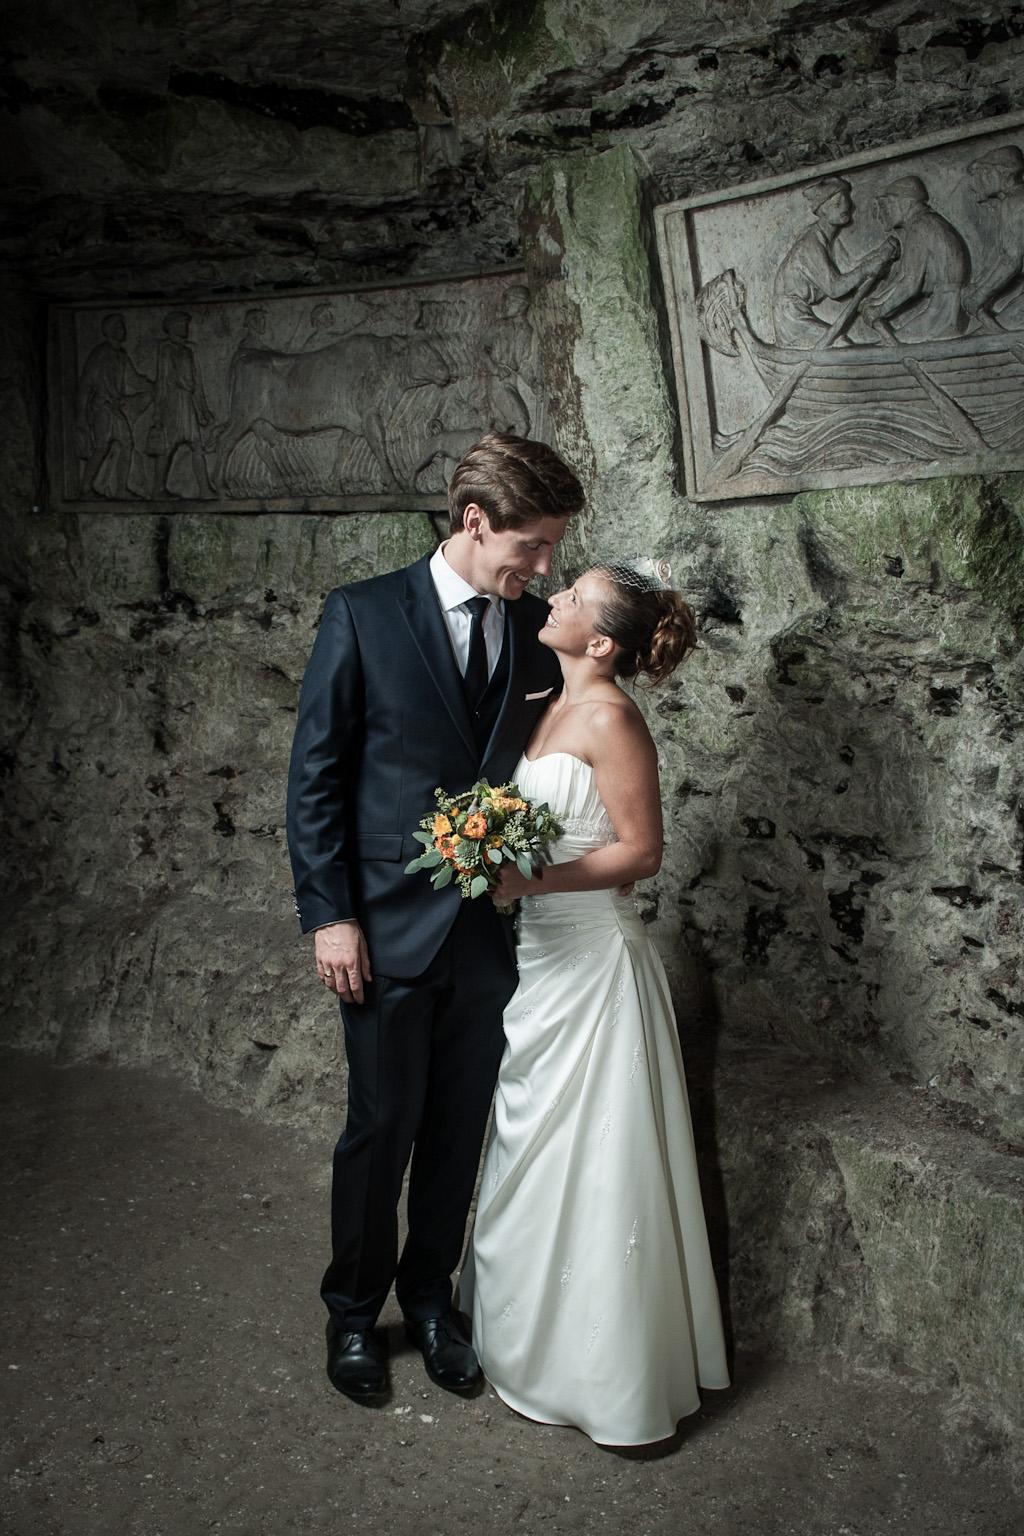 Bryllupsfotografering i Aalborg, Nordjylland